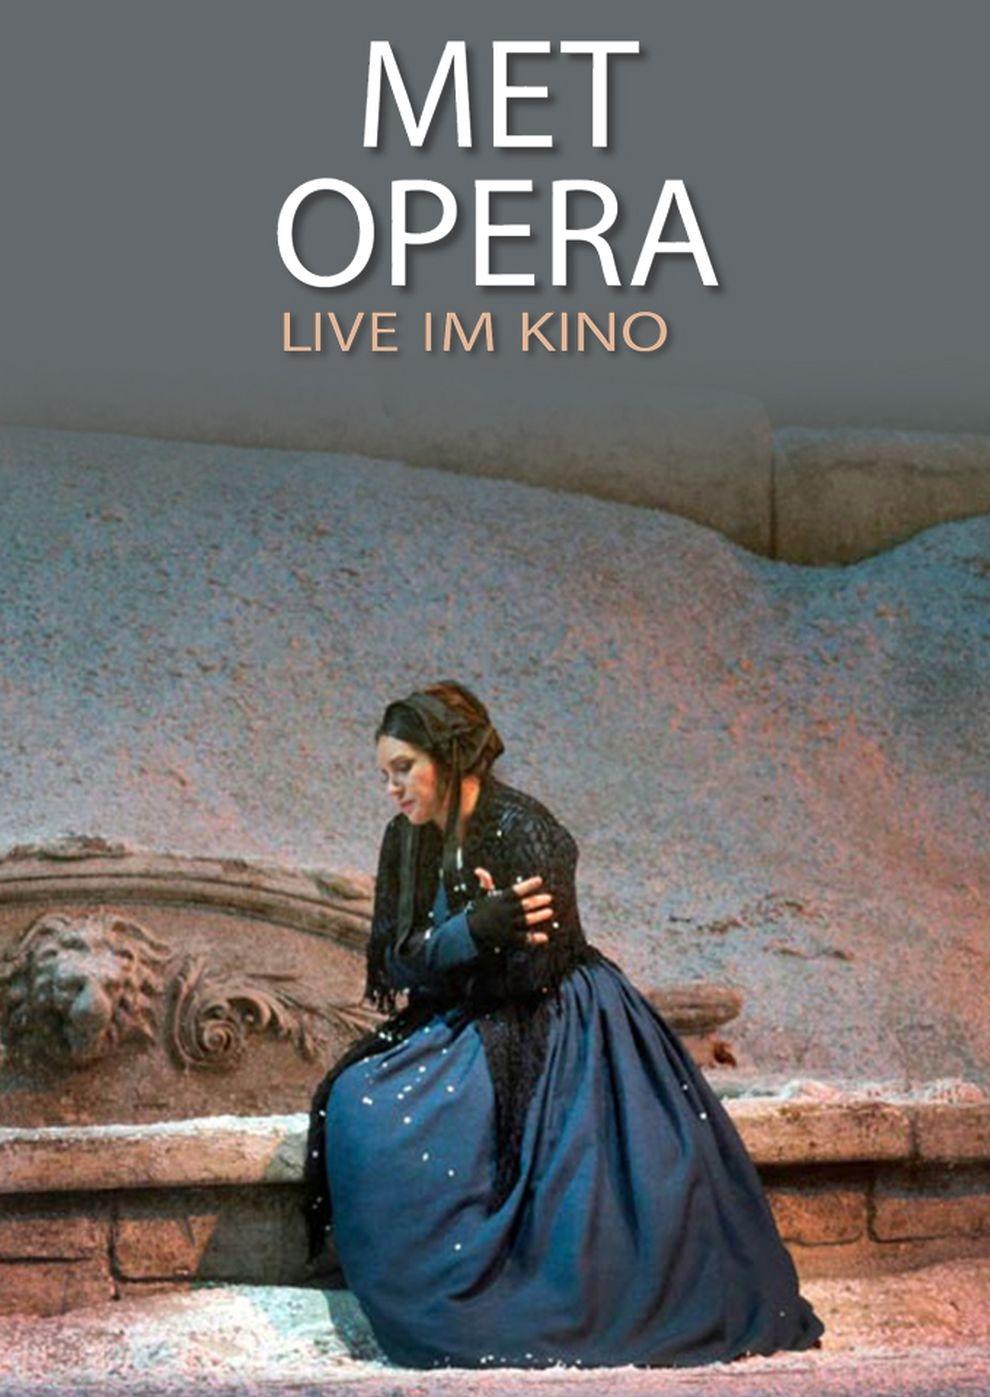 Met Opera 2017/18: La Boheme (Puccini) (Poster)